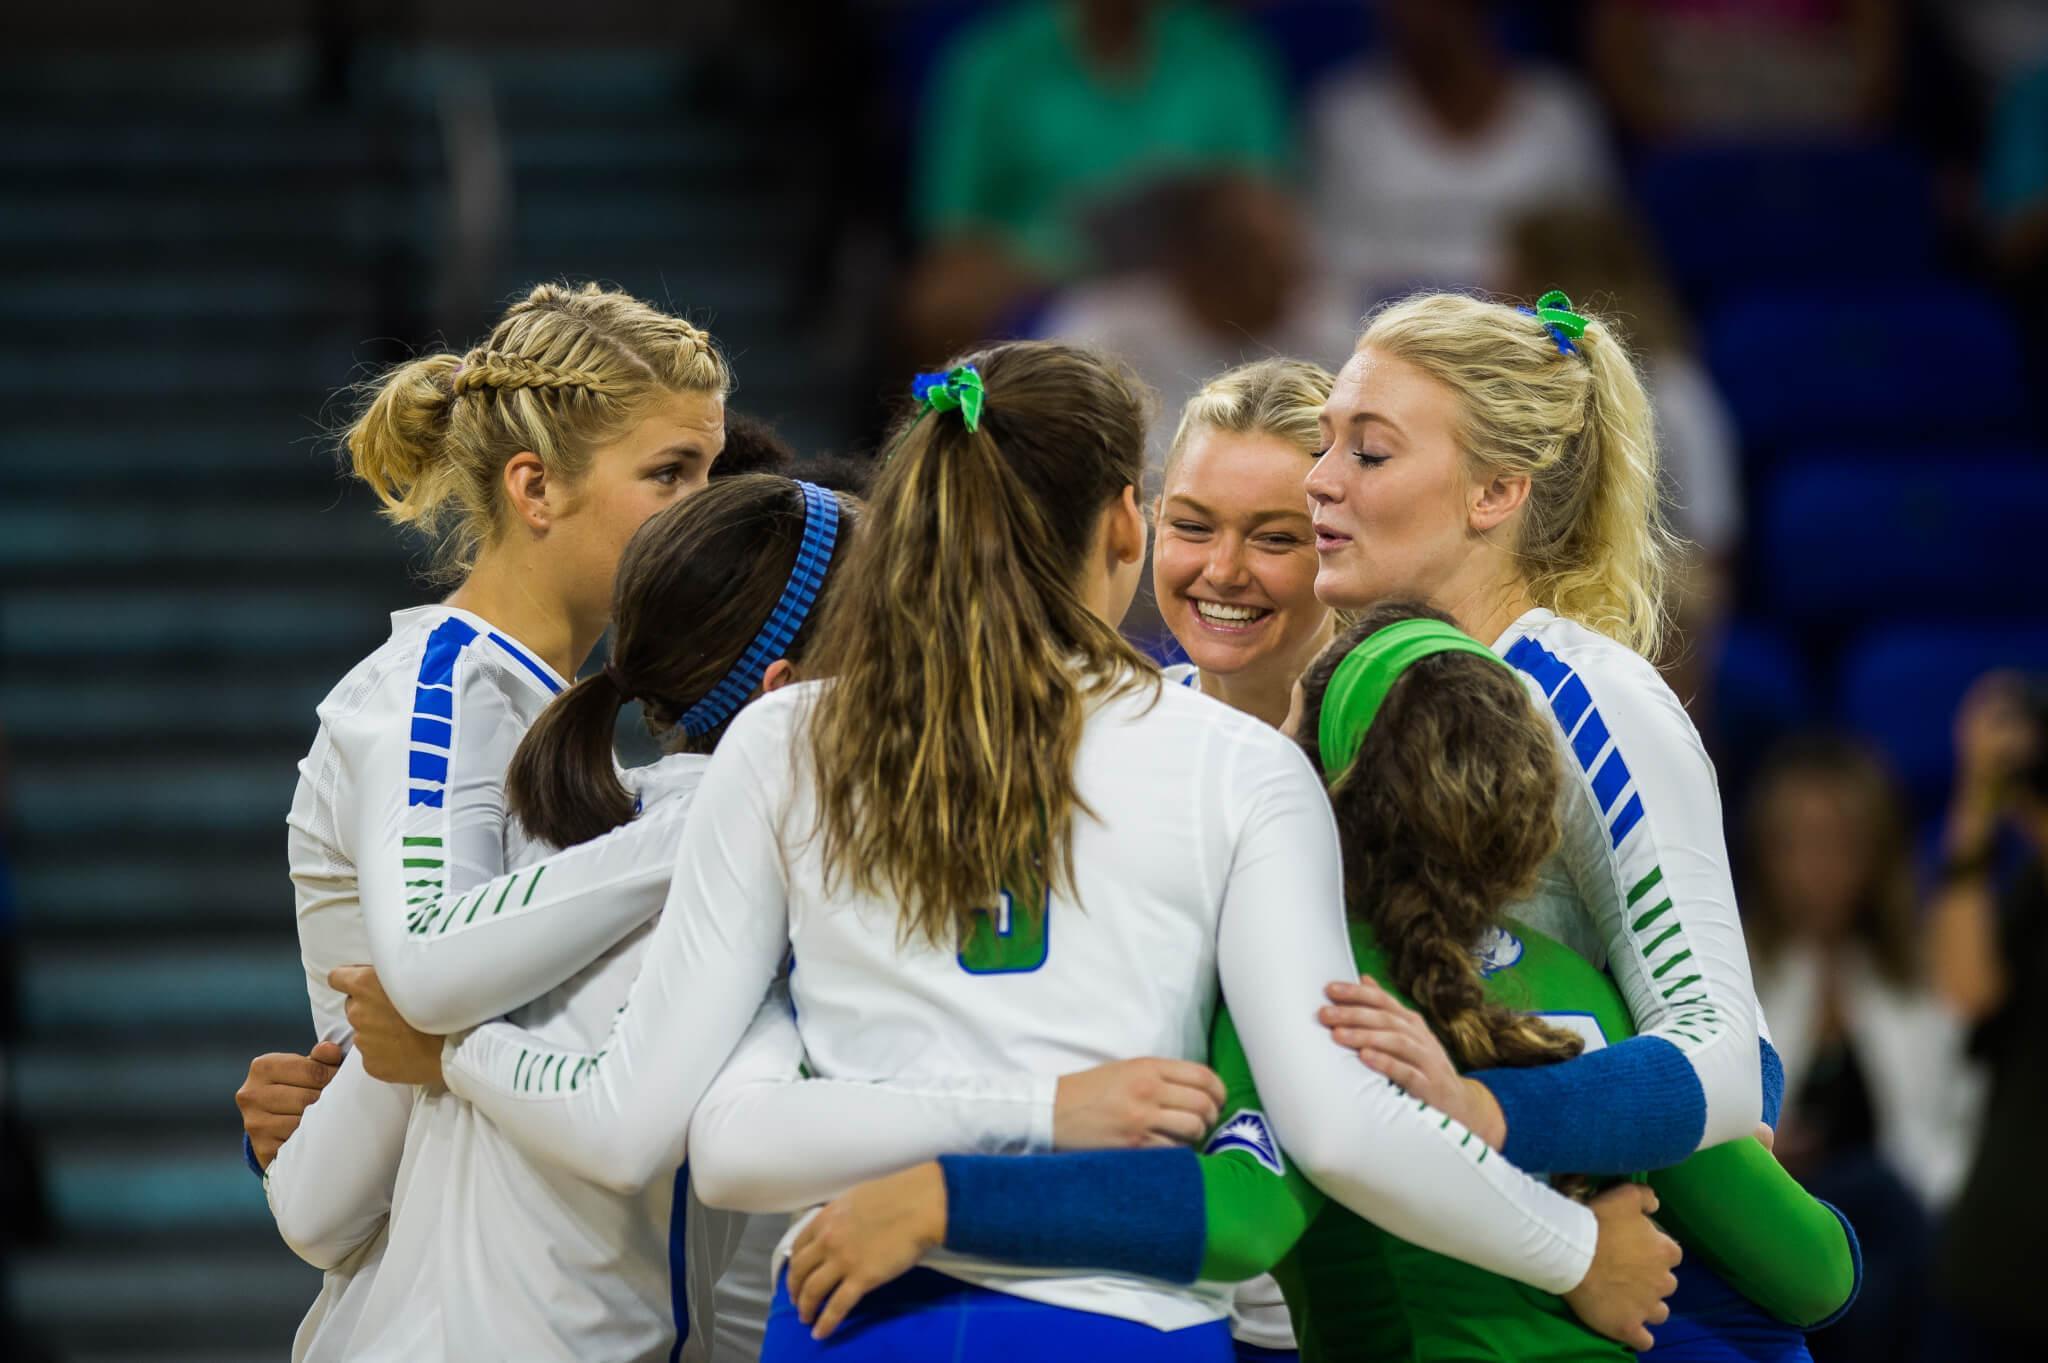 FGCU volleyball signee named 2016 Wendy's High School Heisman finalist